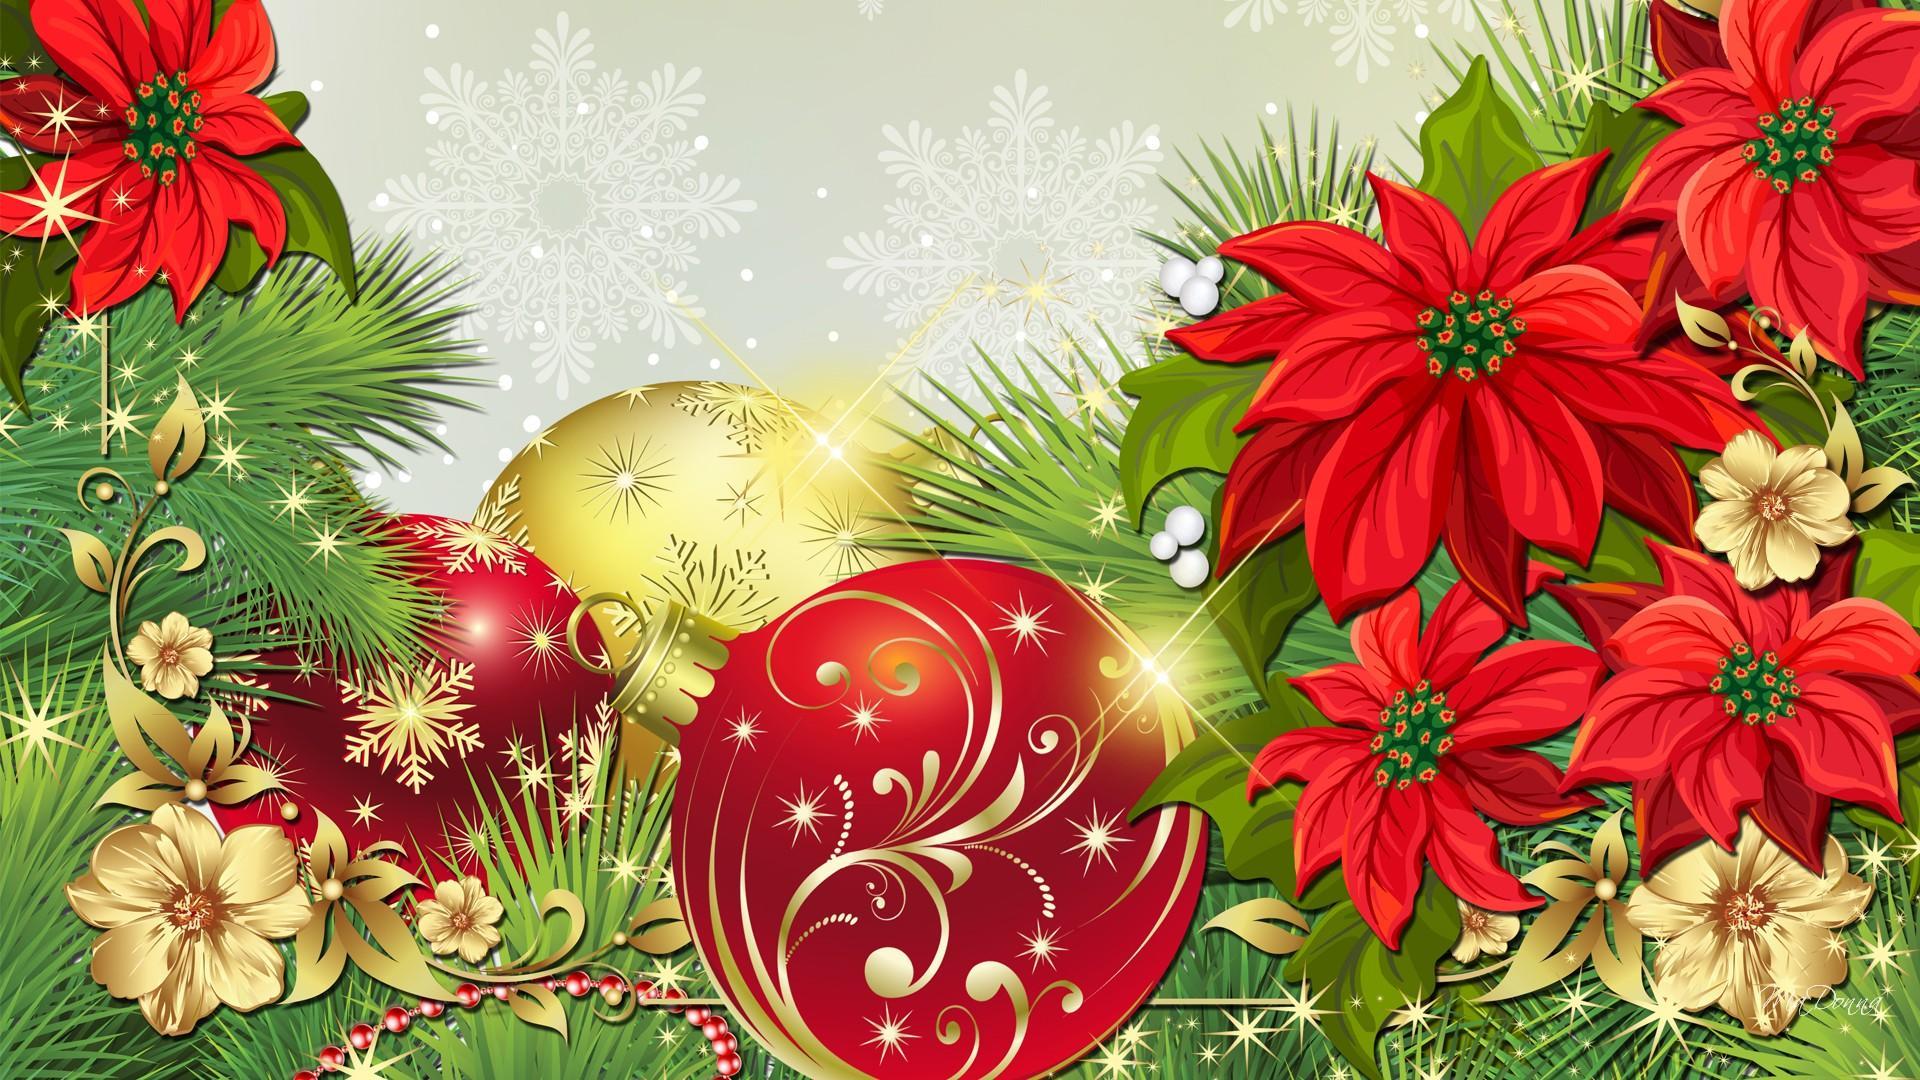 Imagenes De Feliz Navidad Amor Mio Frasesamor Website